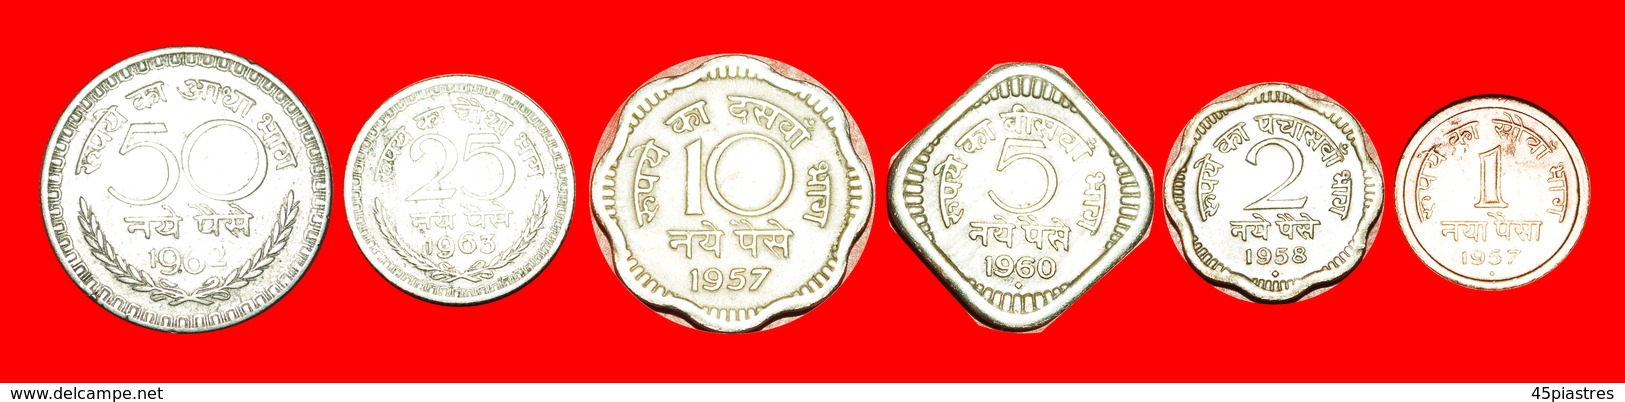 + SET 6 COINS: INDIA ★ 1-2-5-10-25-50 NEW PAISE TYPE 1957-1963! LOW START ★ NO RESERVE! - Kilowaar - Munten